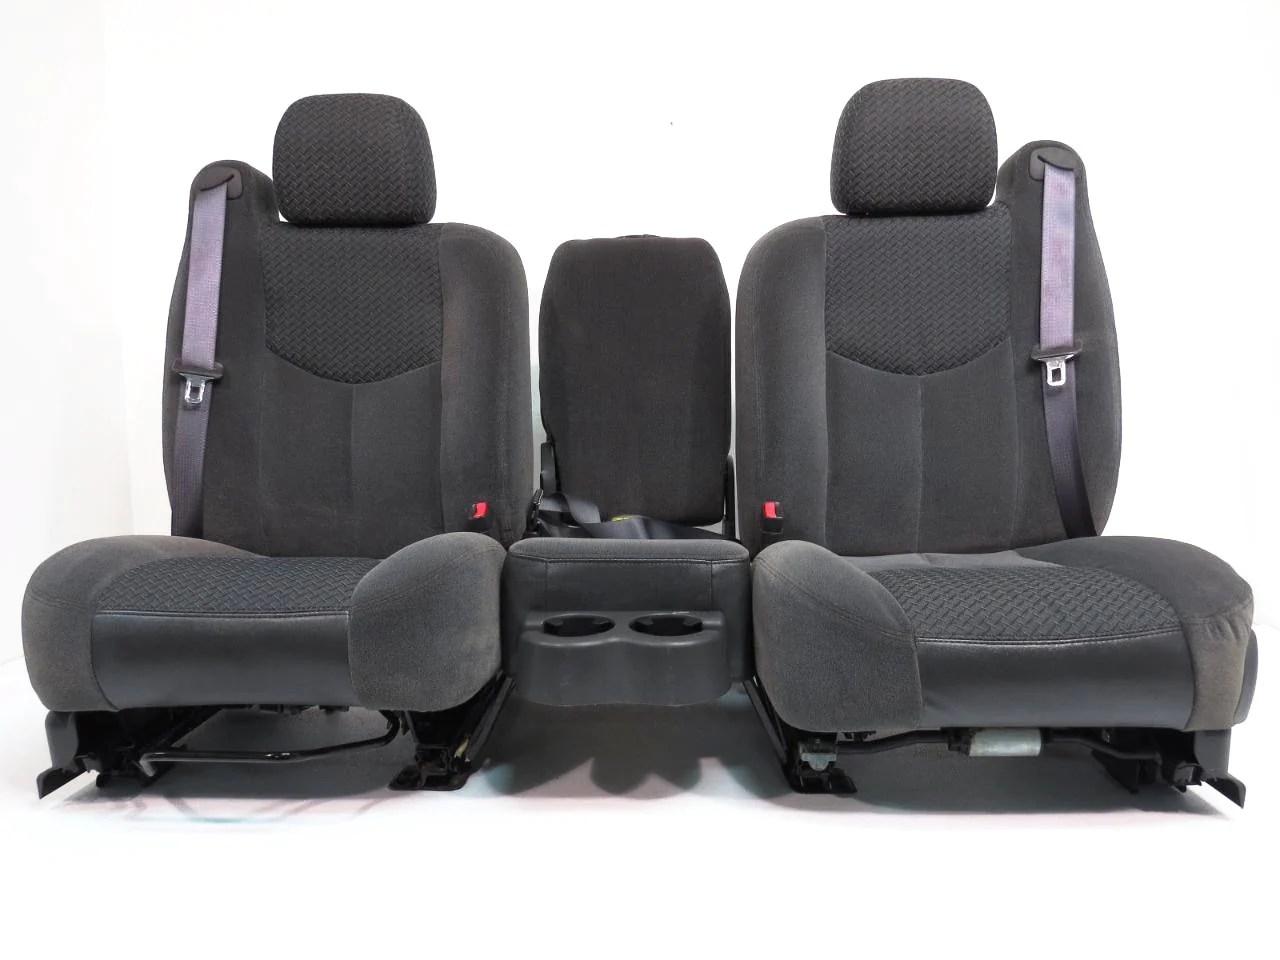 hight resolution of chevy gmc truck suv dark grey cloth front seats 2000 2001 2002 2003 2004 2005 2006